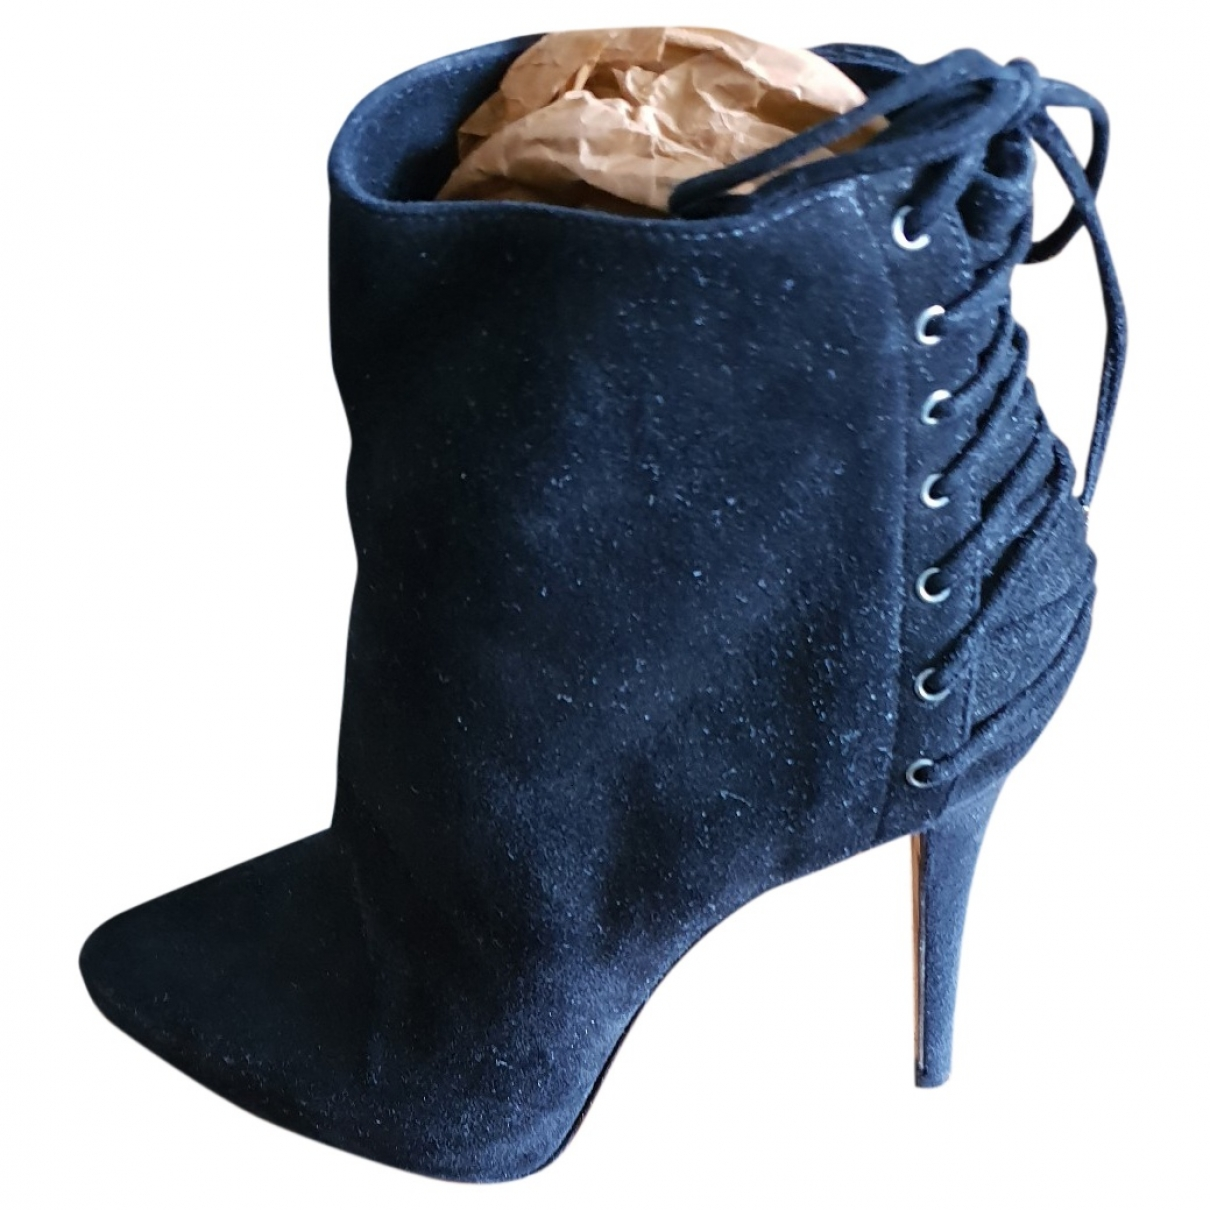 Le Silla \N Stiefel in  Schwarz Veloursleder